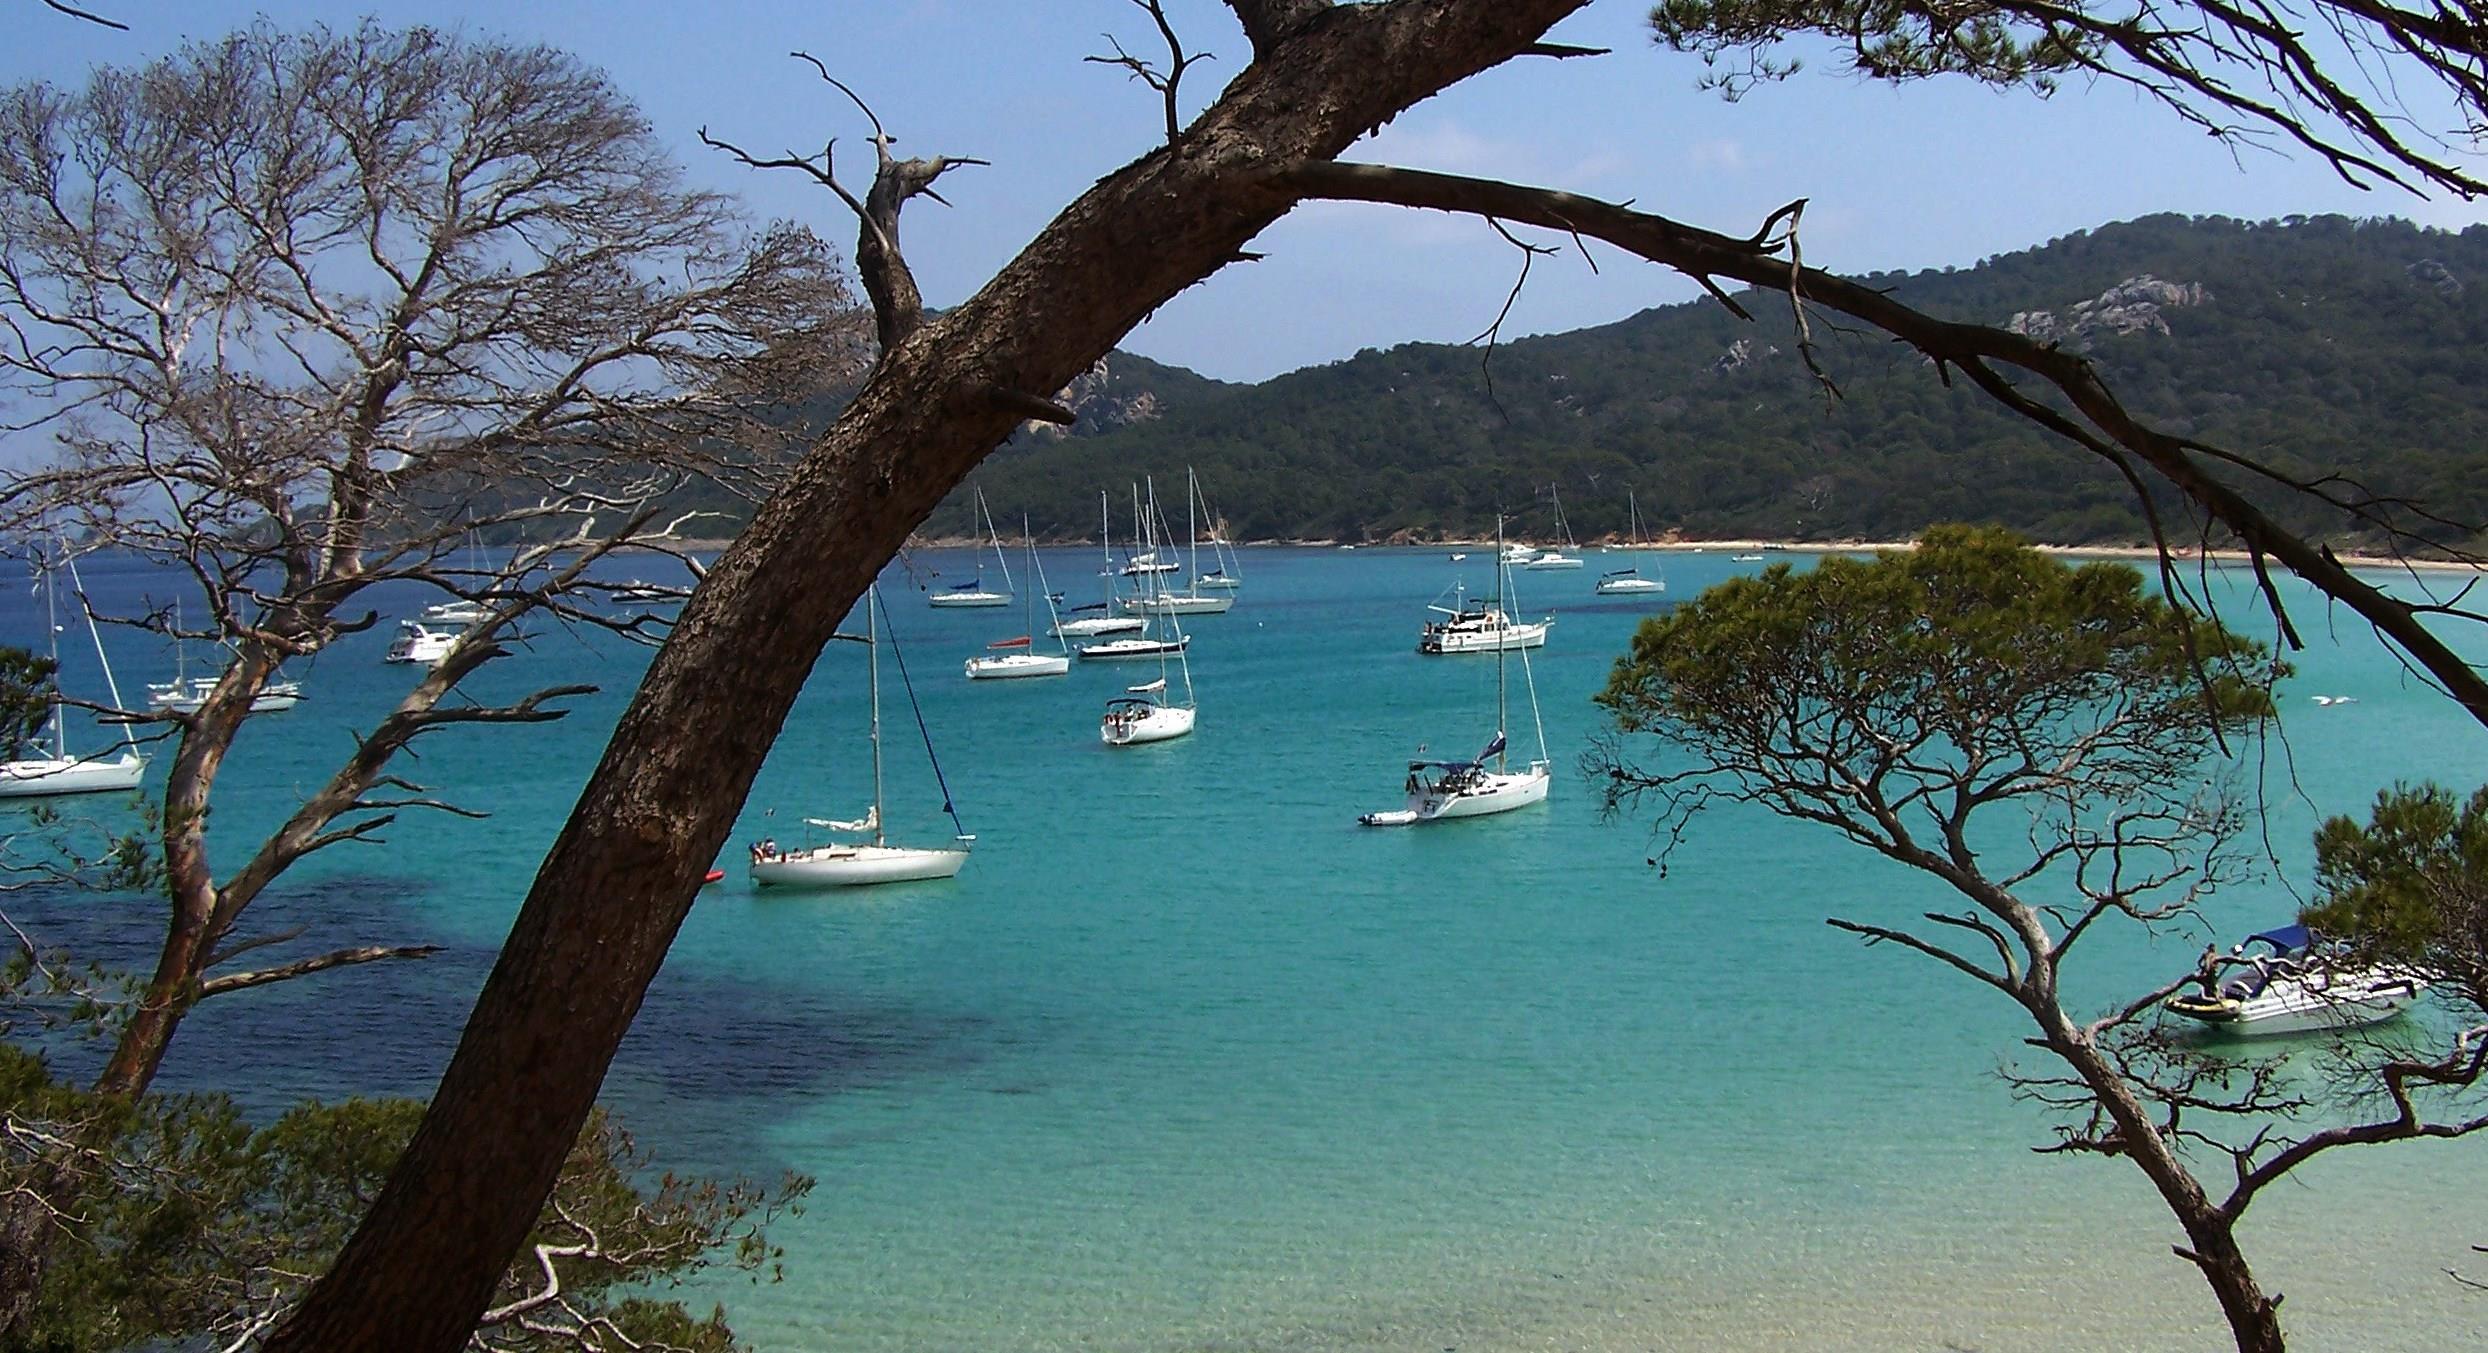 Camping Cote D'azur Bord De Mer Piscine - Camping Direct destiné Camping Bord De Mer Mediterranee Avec Piscine